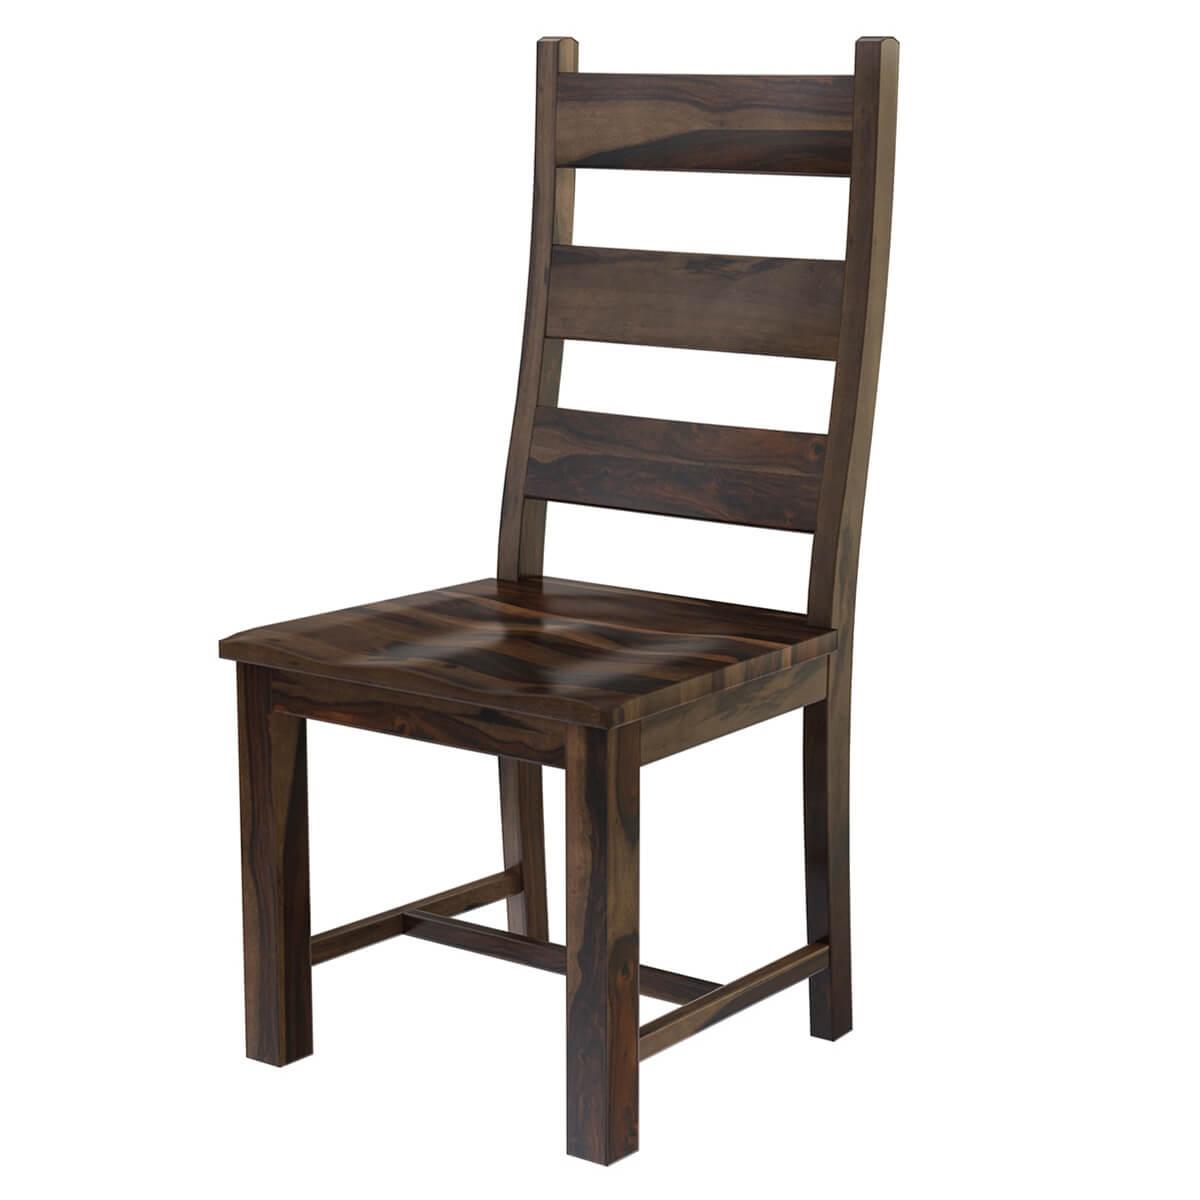 Modern Pioneer Rustic Solid Wood Ladder Back Dining Chair